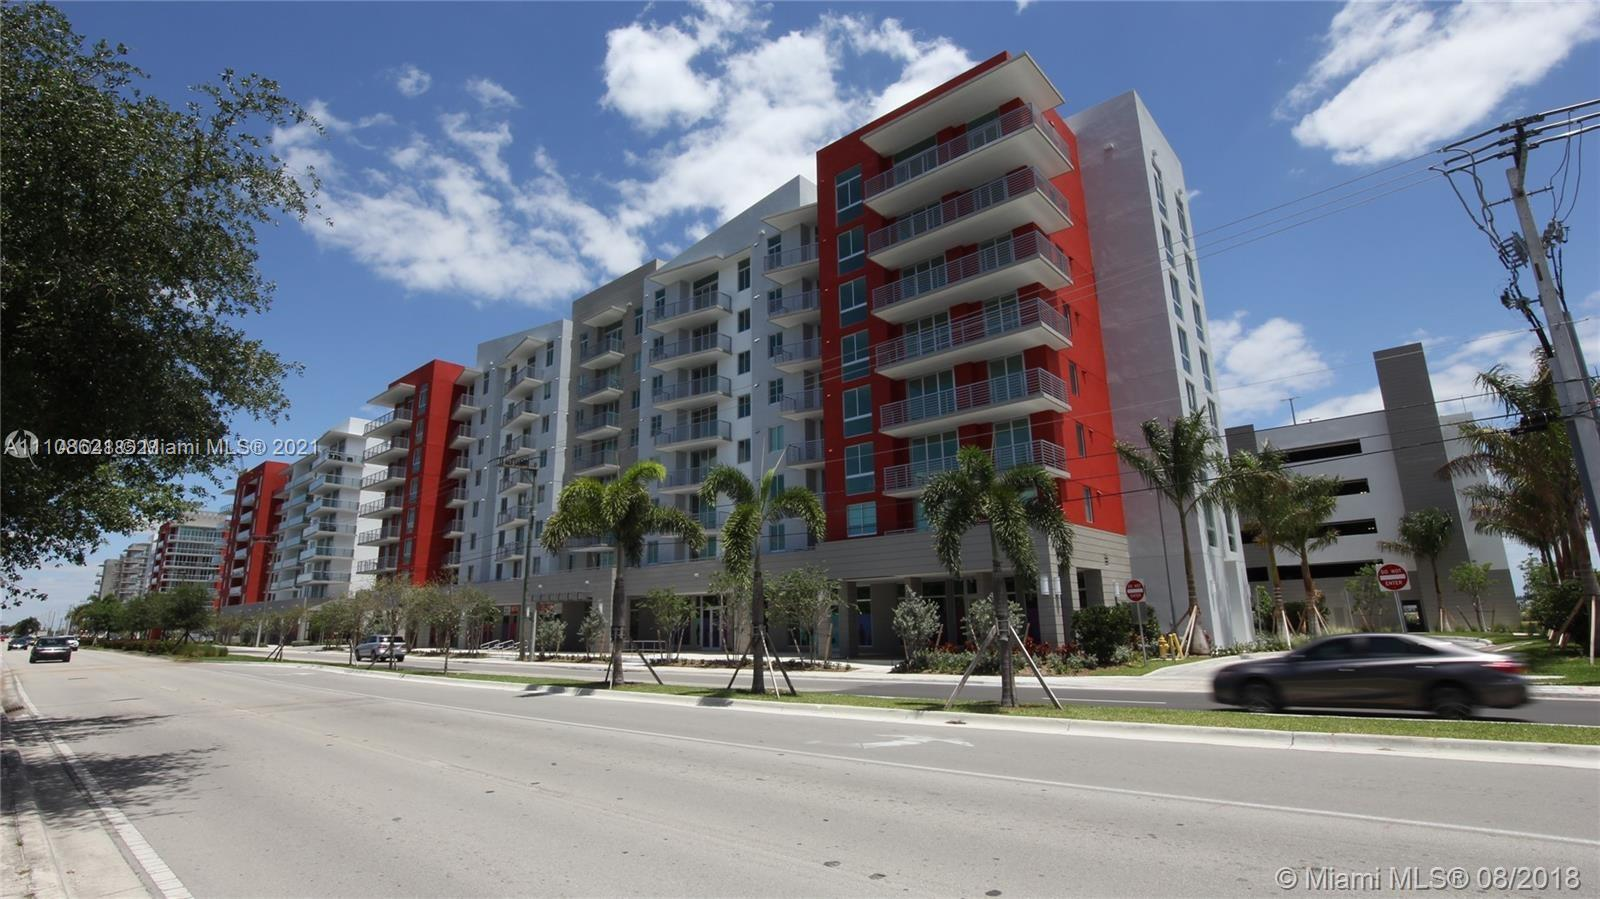 7875 107th Ave Unit 507, Doral, Florida 33178